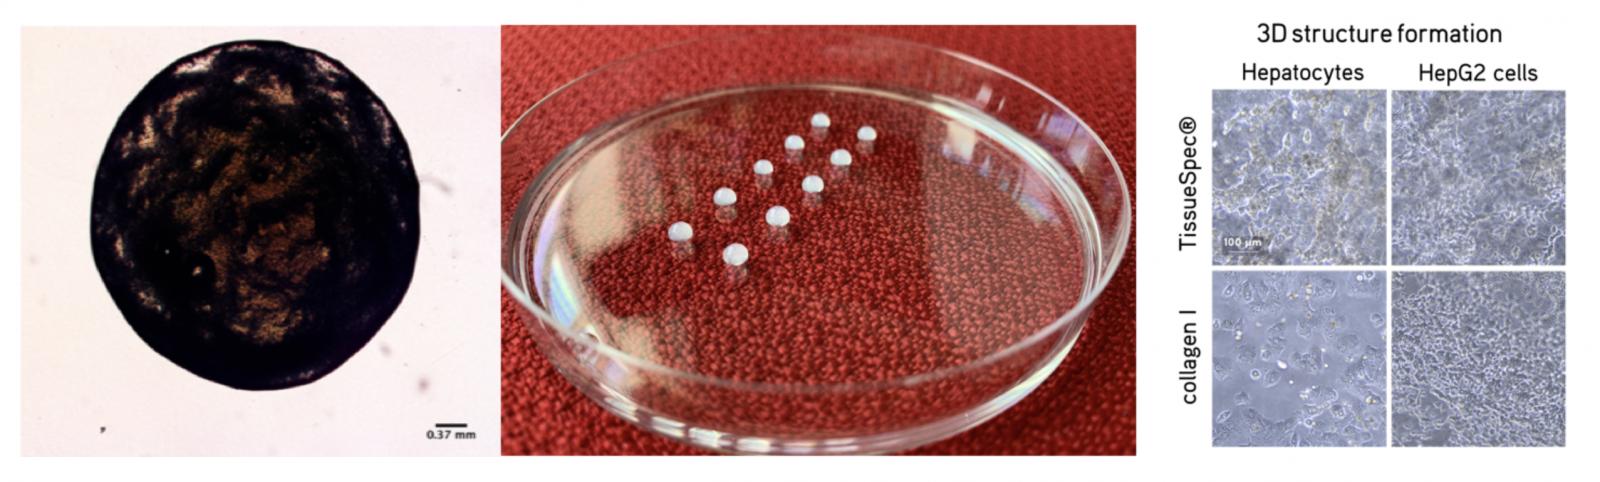 Bioprinting Liver Tissue